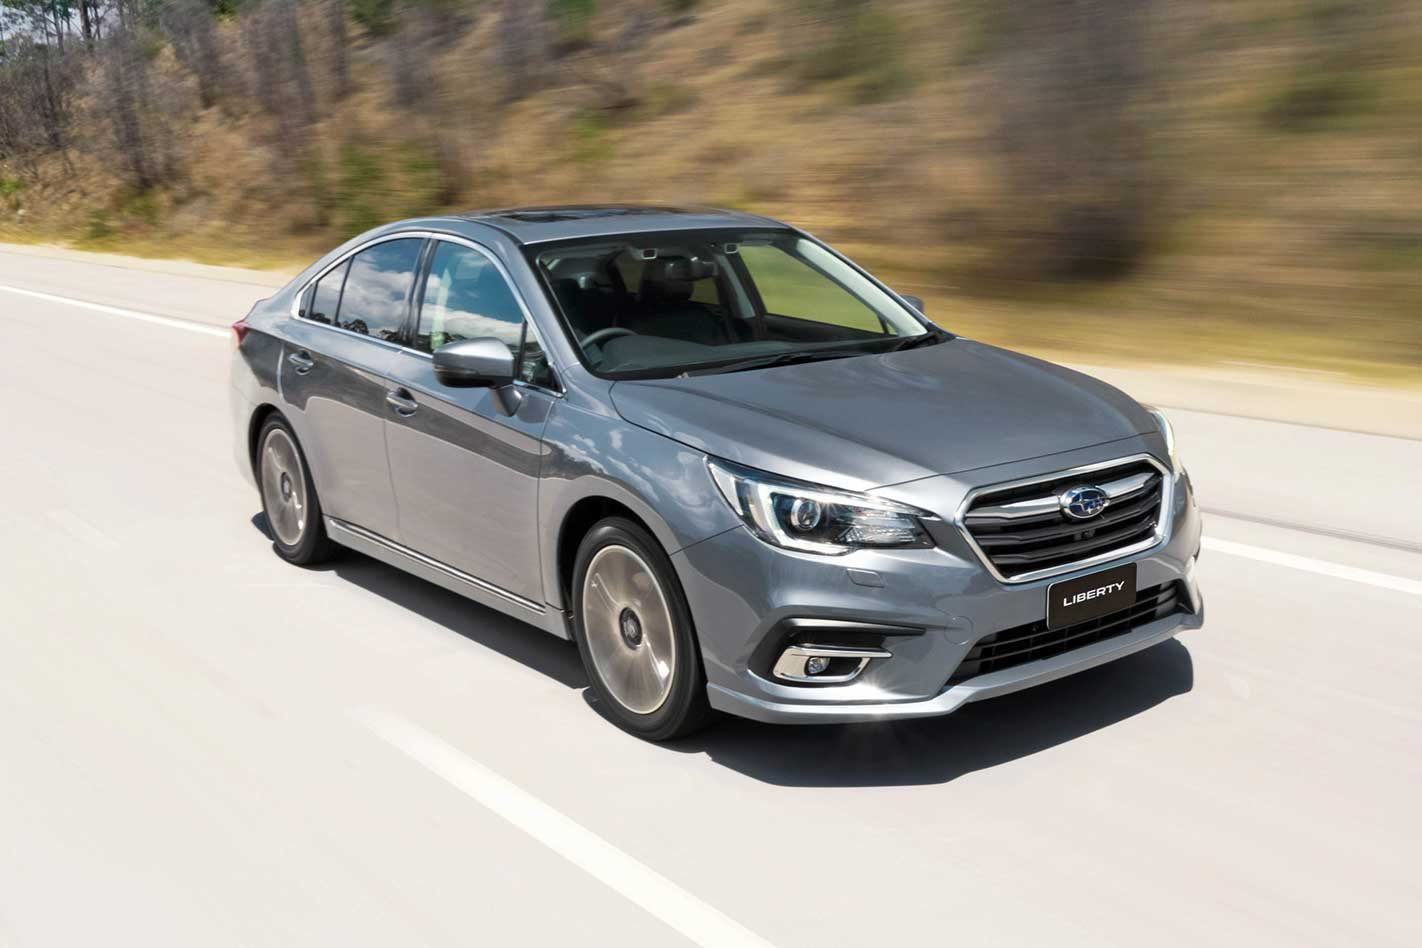 2018 Subaru Liberty 3 6r Quick Performance Review